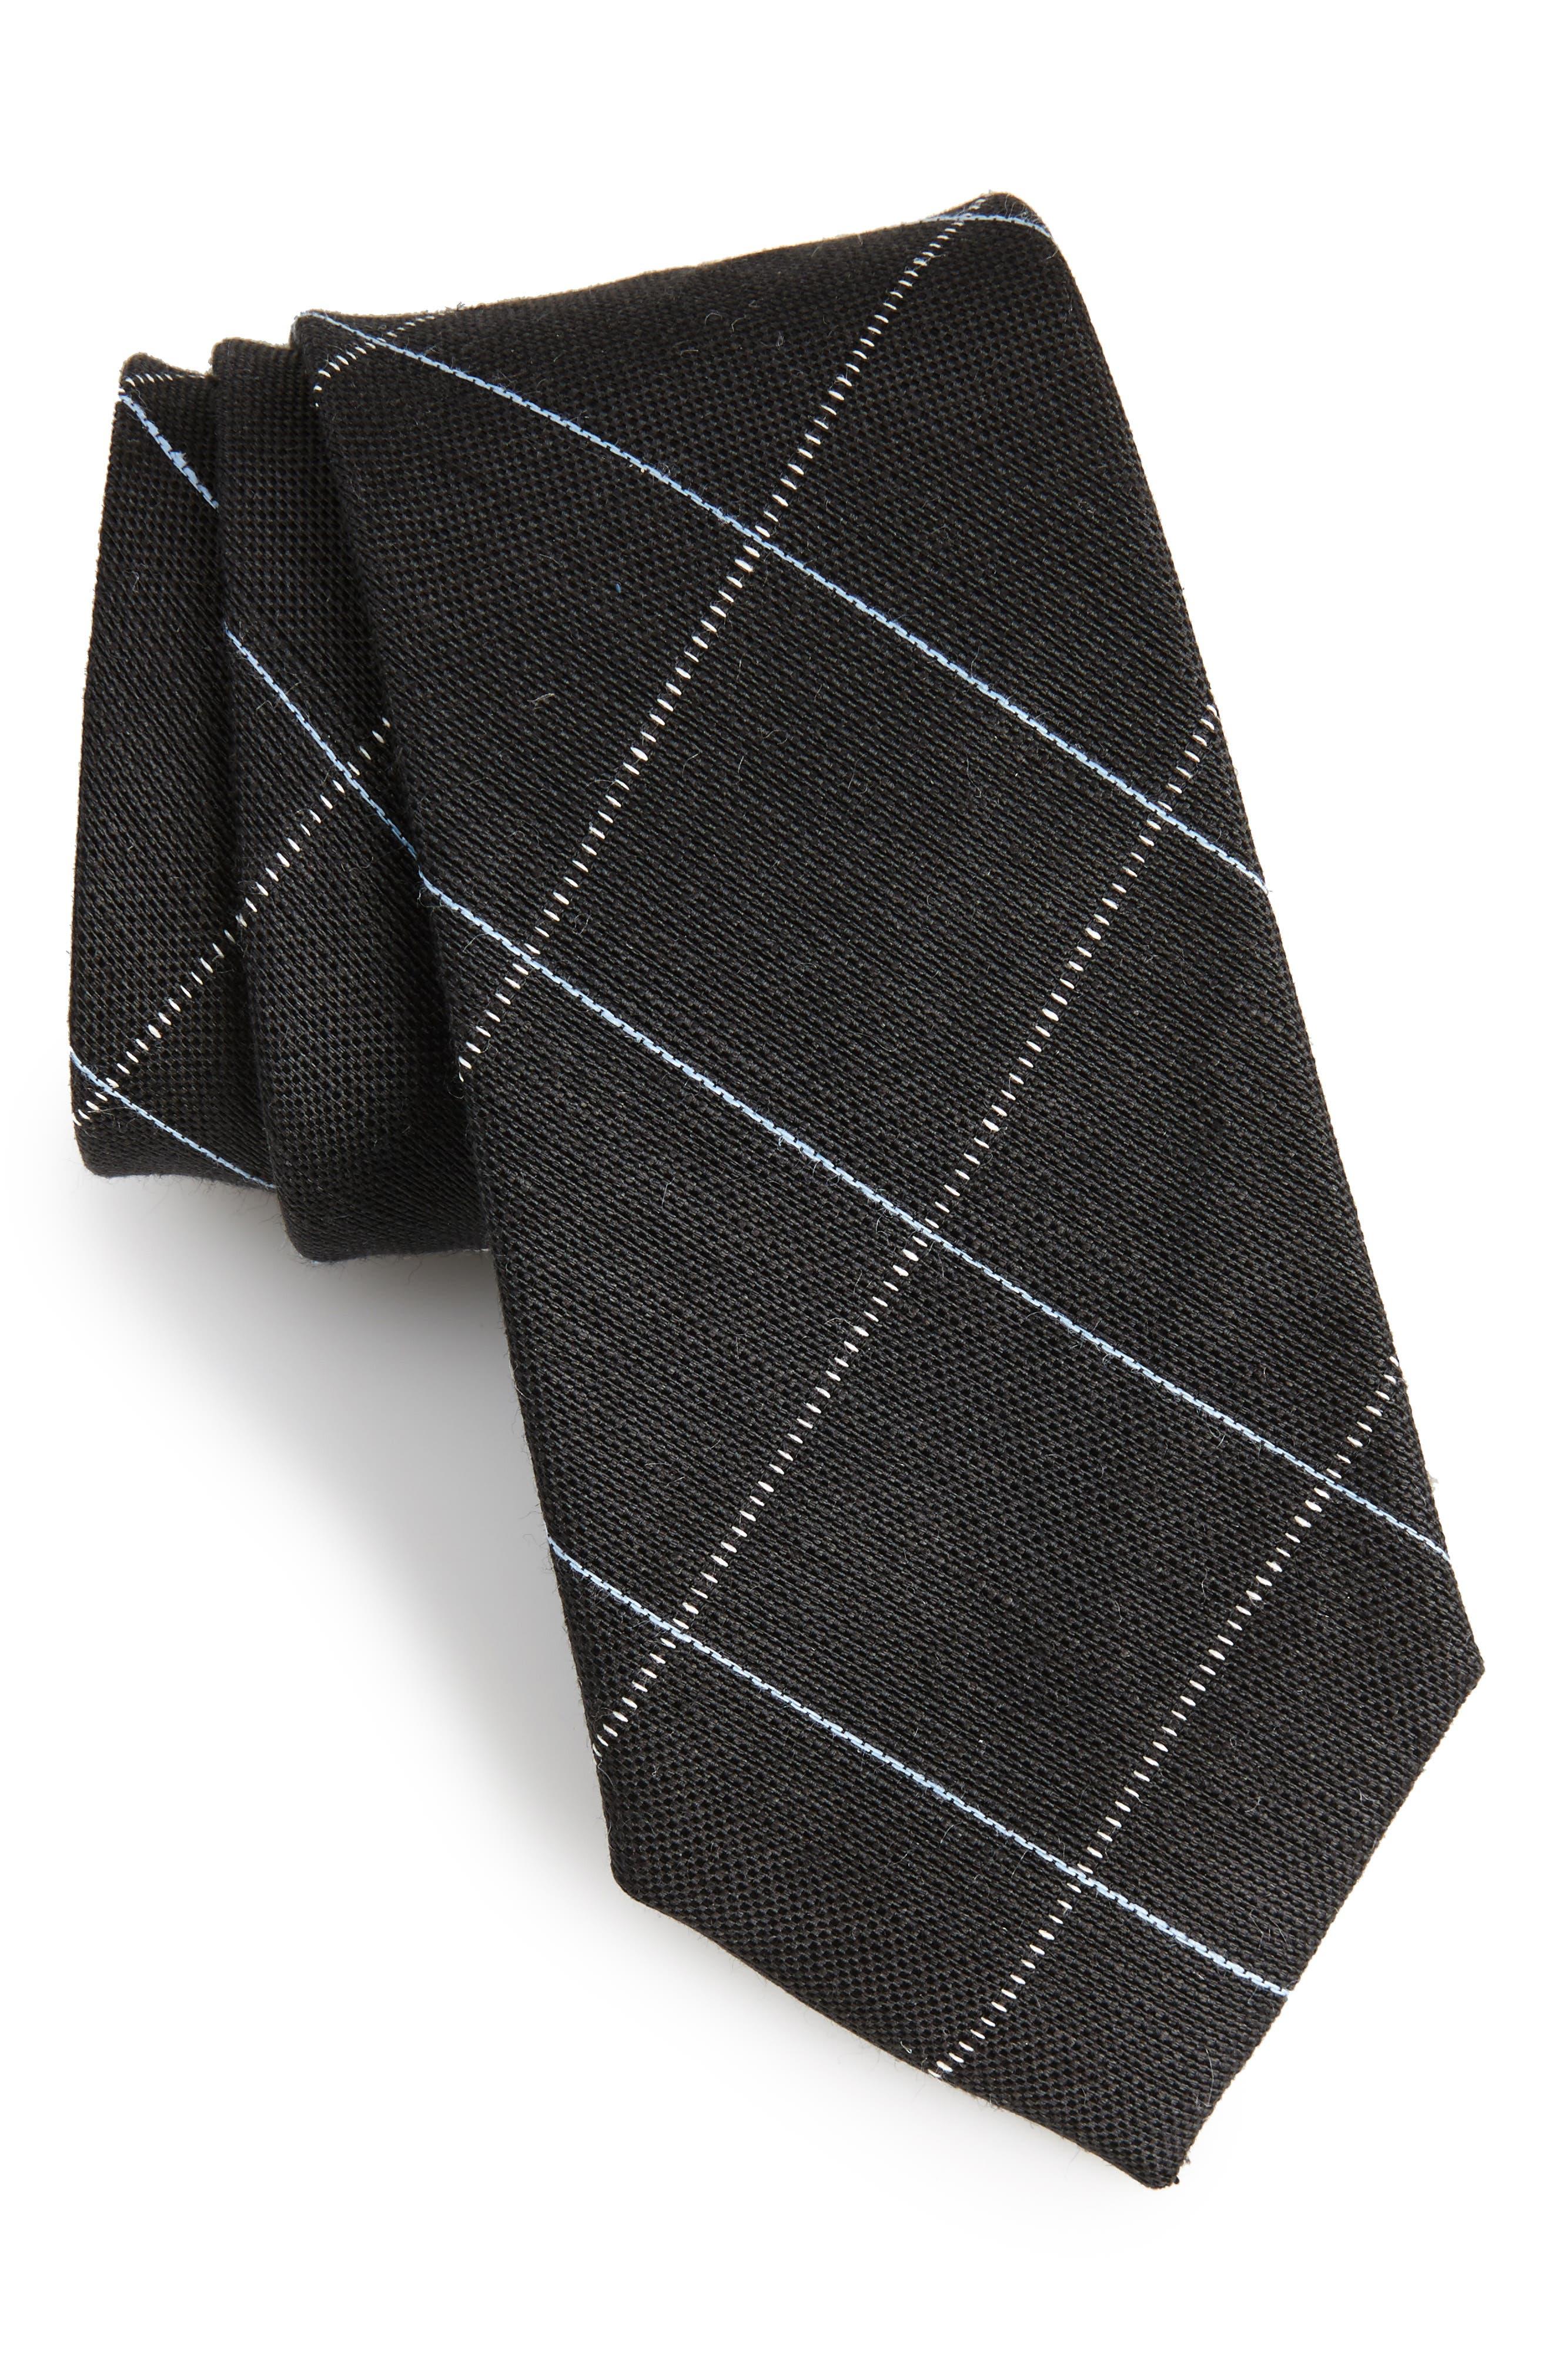 Candler Grid Linen & Silk Tie,                             Main thumbnail 1, color,                             001